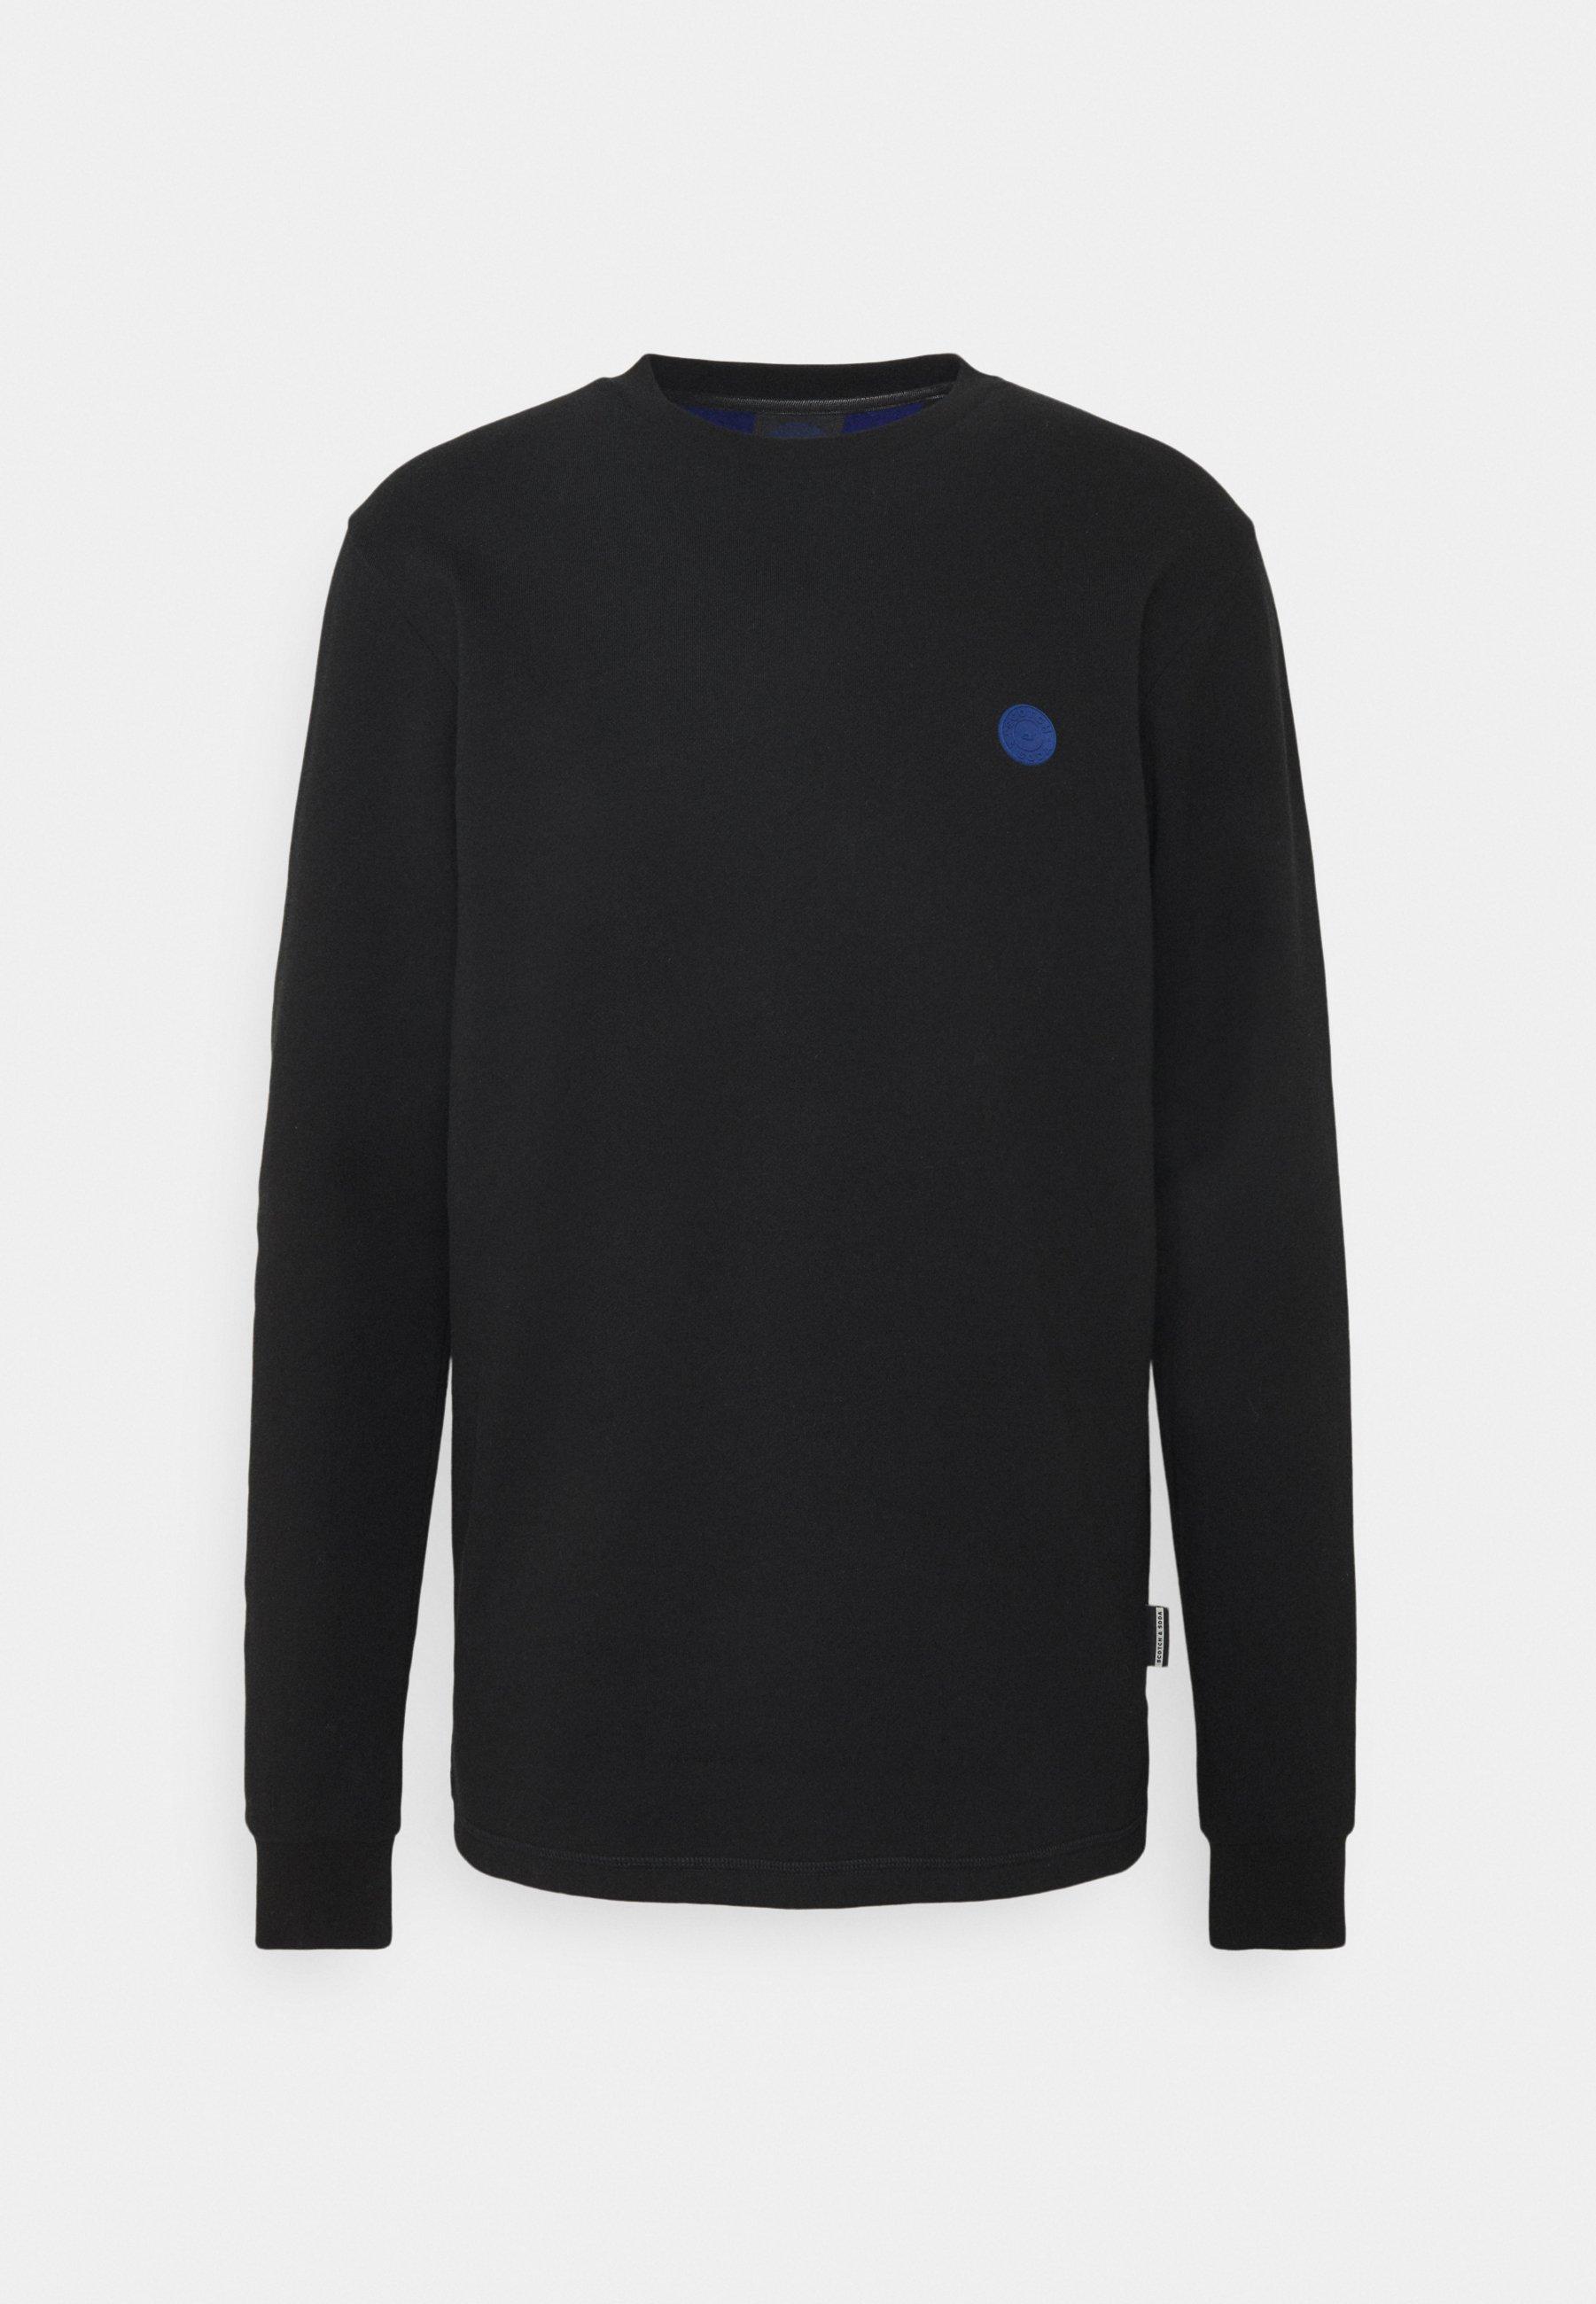 Homme CREW NECK WITH TONAL CHEST ARTWORK - Sweatshirt